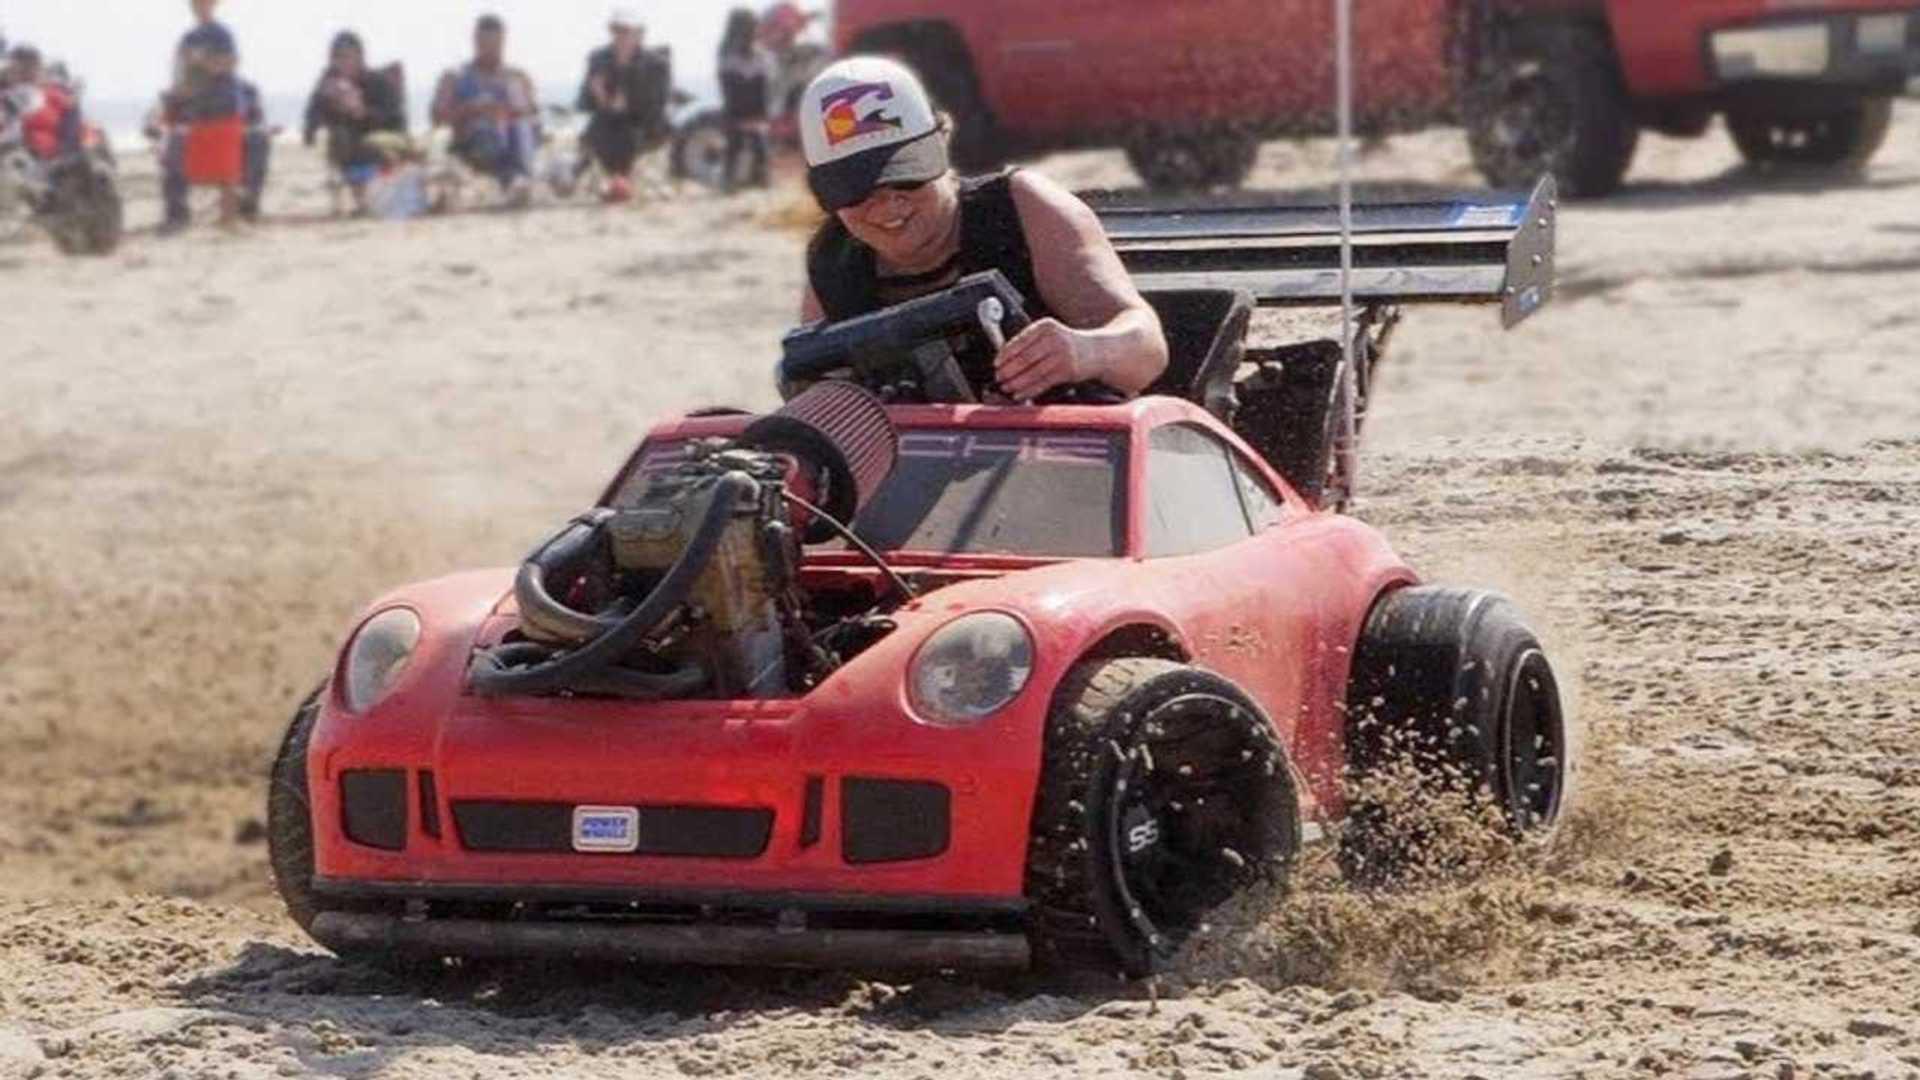 Custom Porsche Power Wheels gets motorcycle engine in amazing build